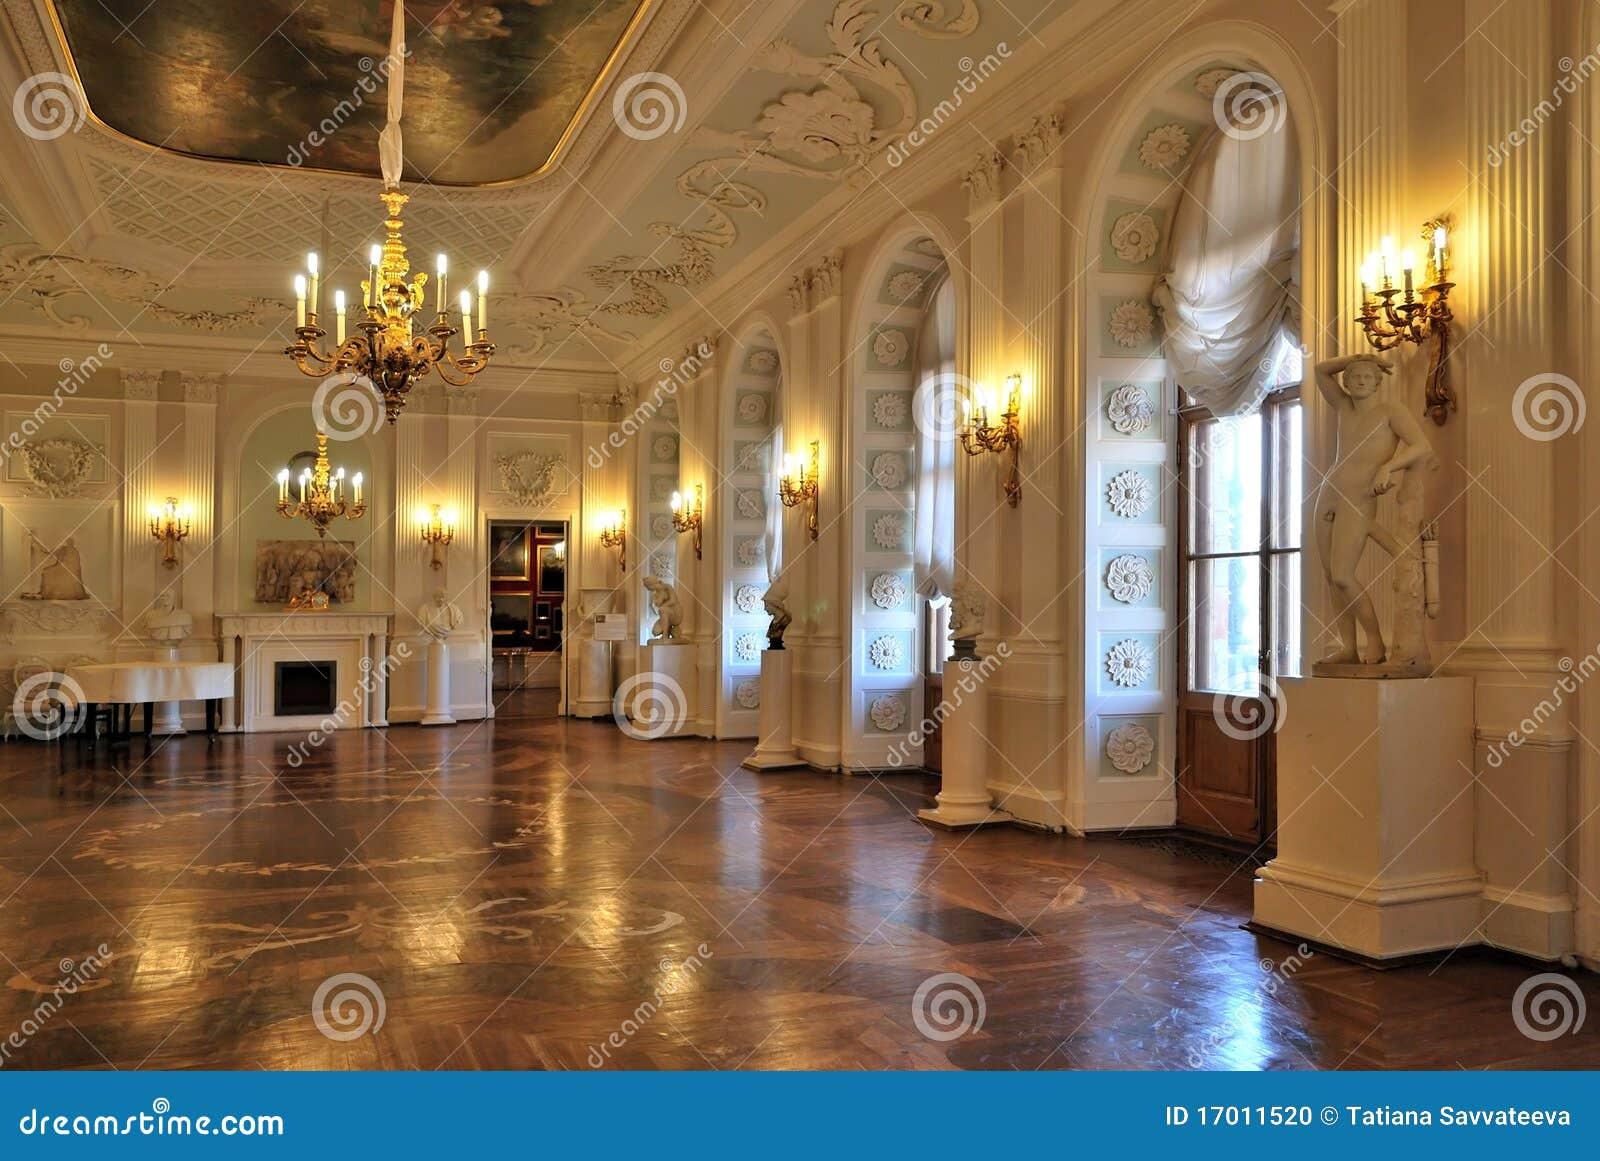 gatchina大厅宫殿彼得斯堡st白色.图片